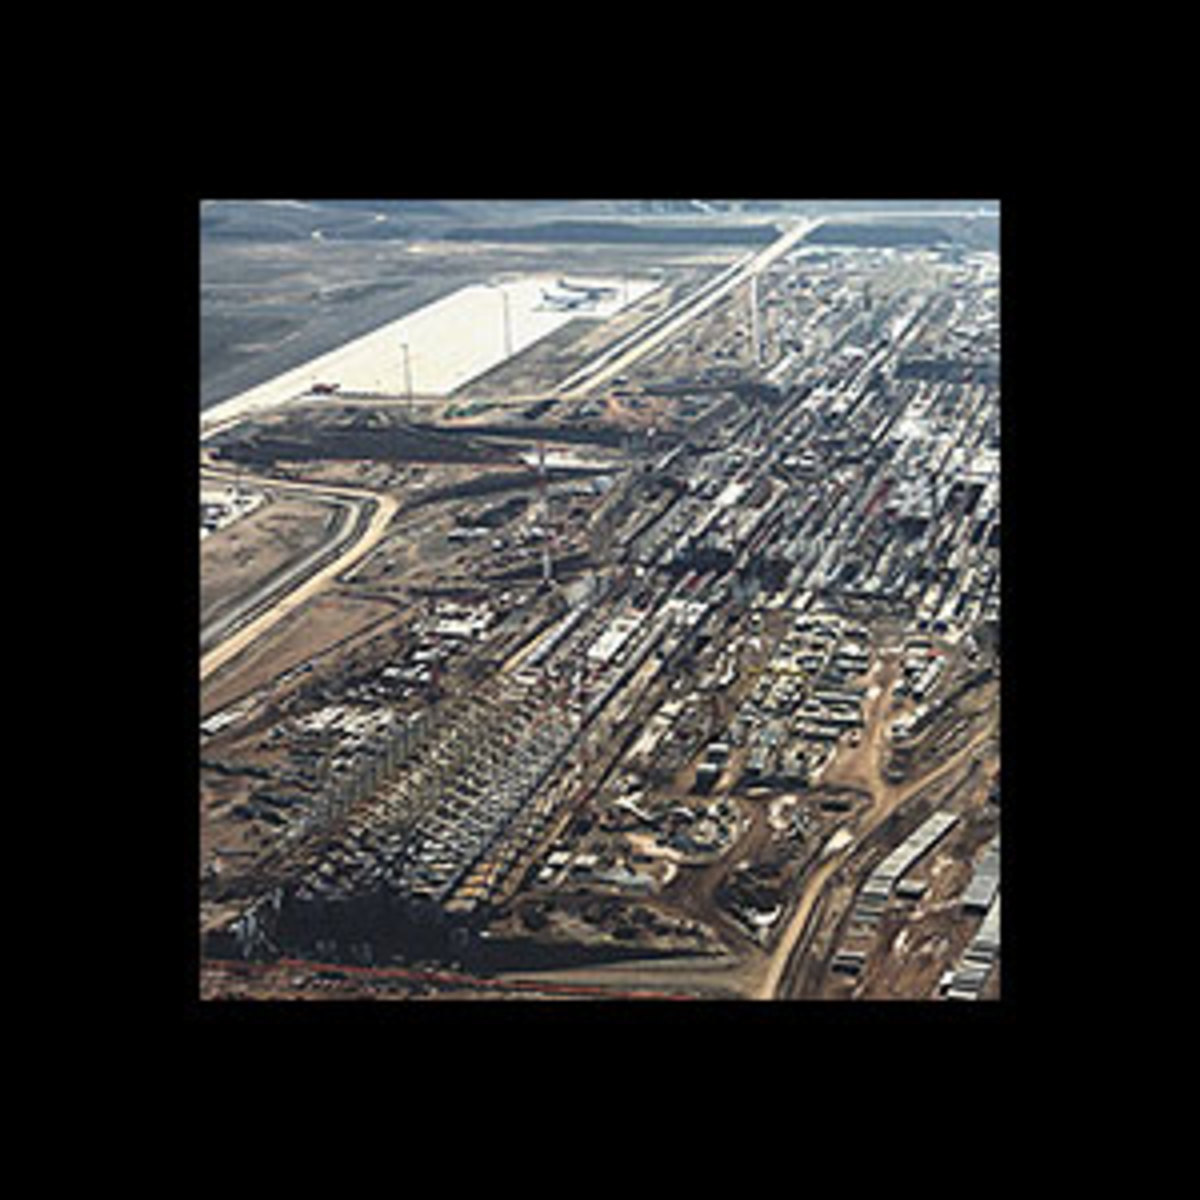 Aeroporto di Barajas, Madrid<br> Richard Rogers, 2004